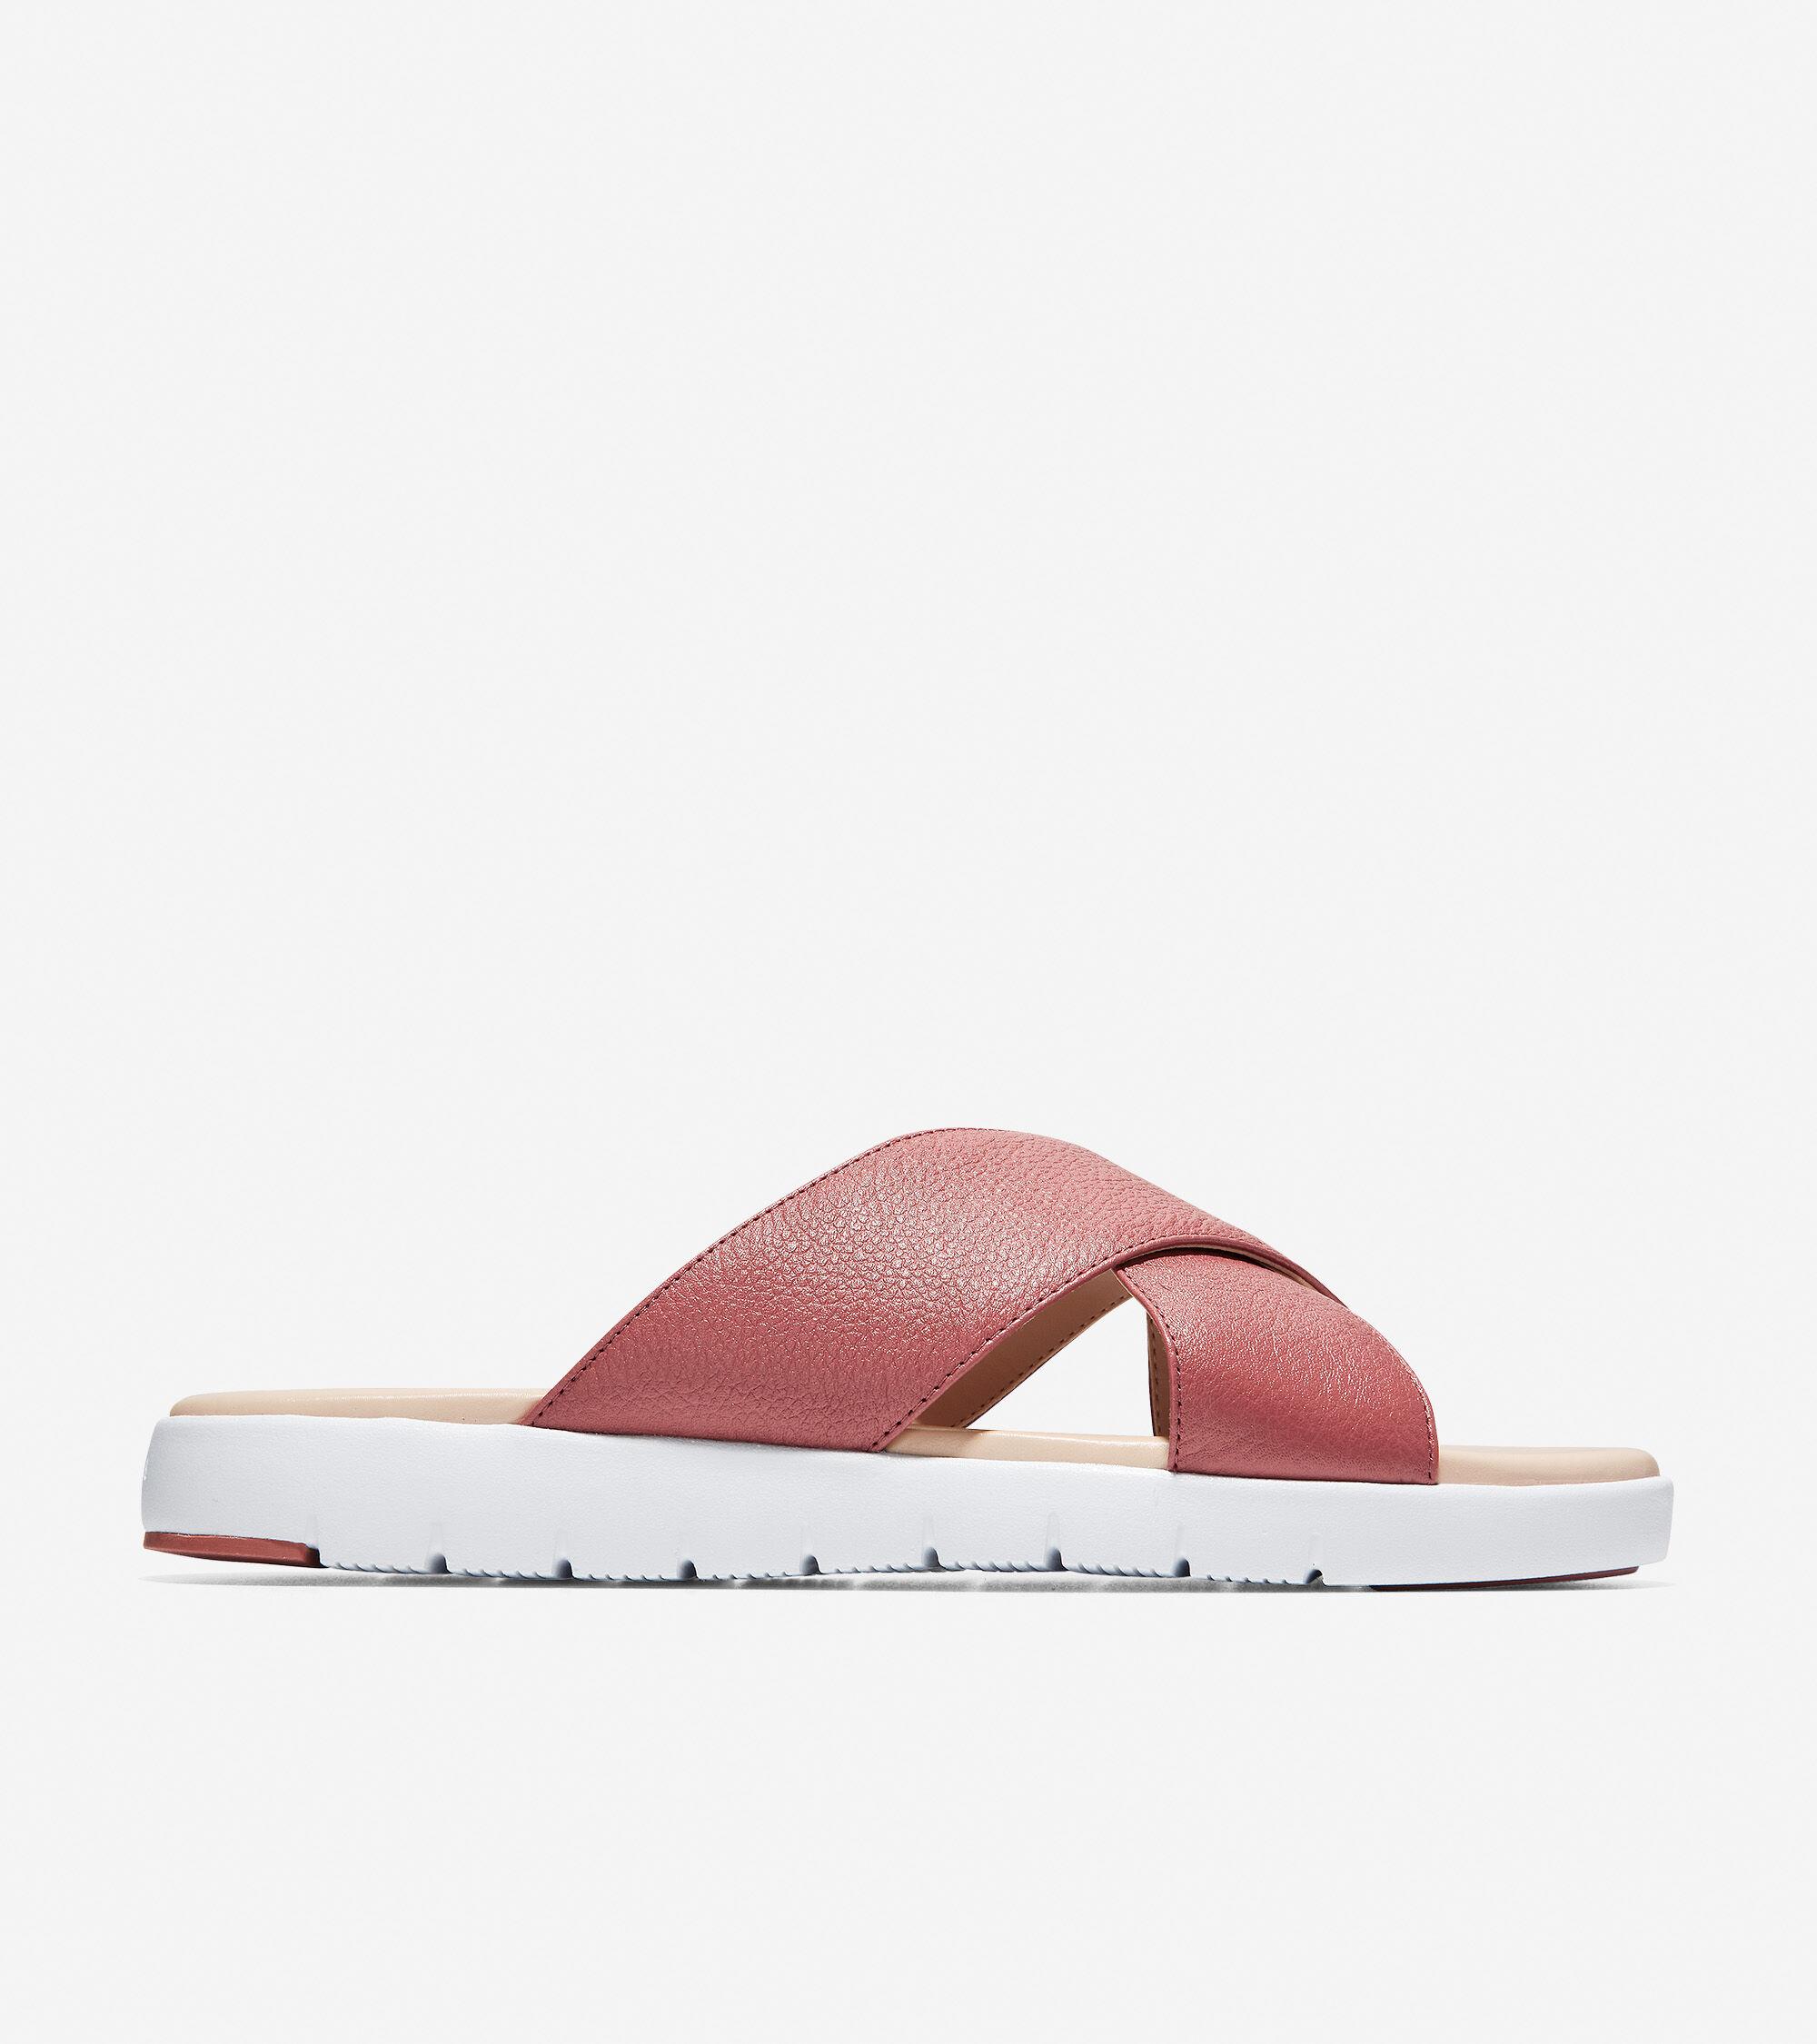 Cole Haan Women's ZEROGRAND Criss-Cross Slide Sandal